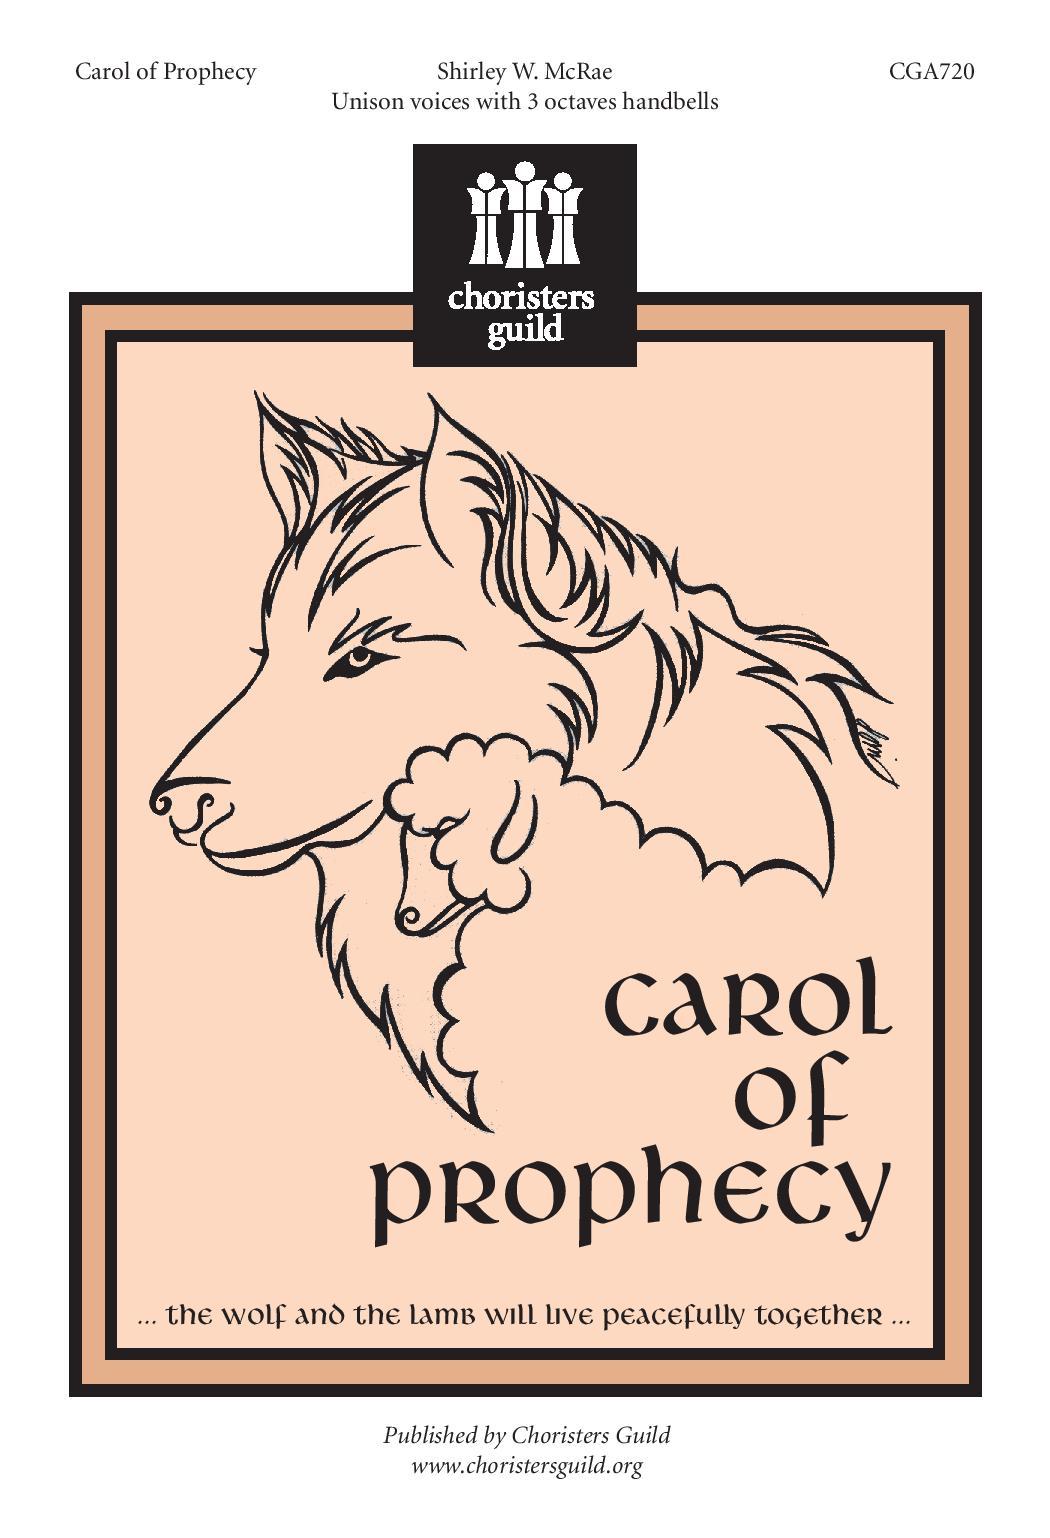 Carol of Prophecy